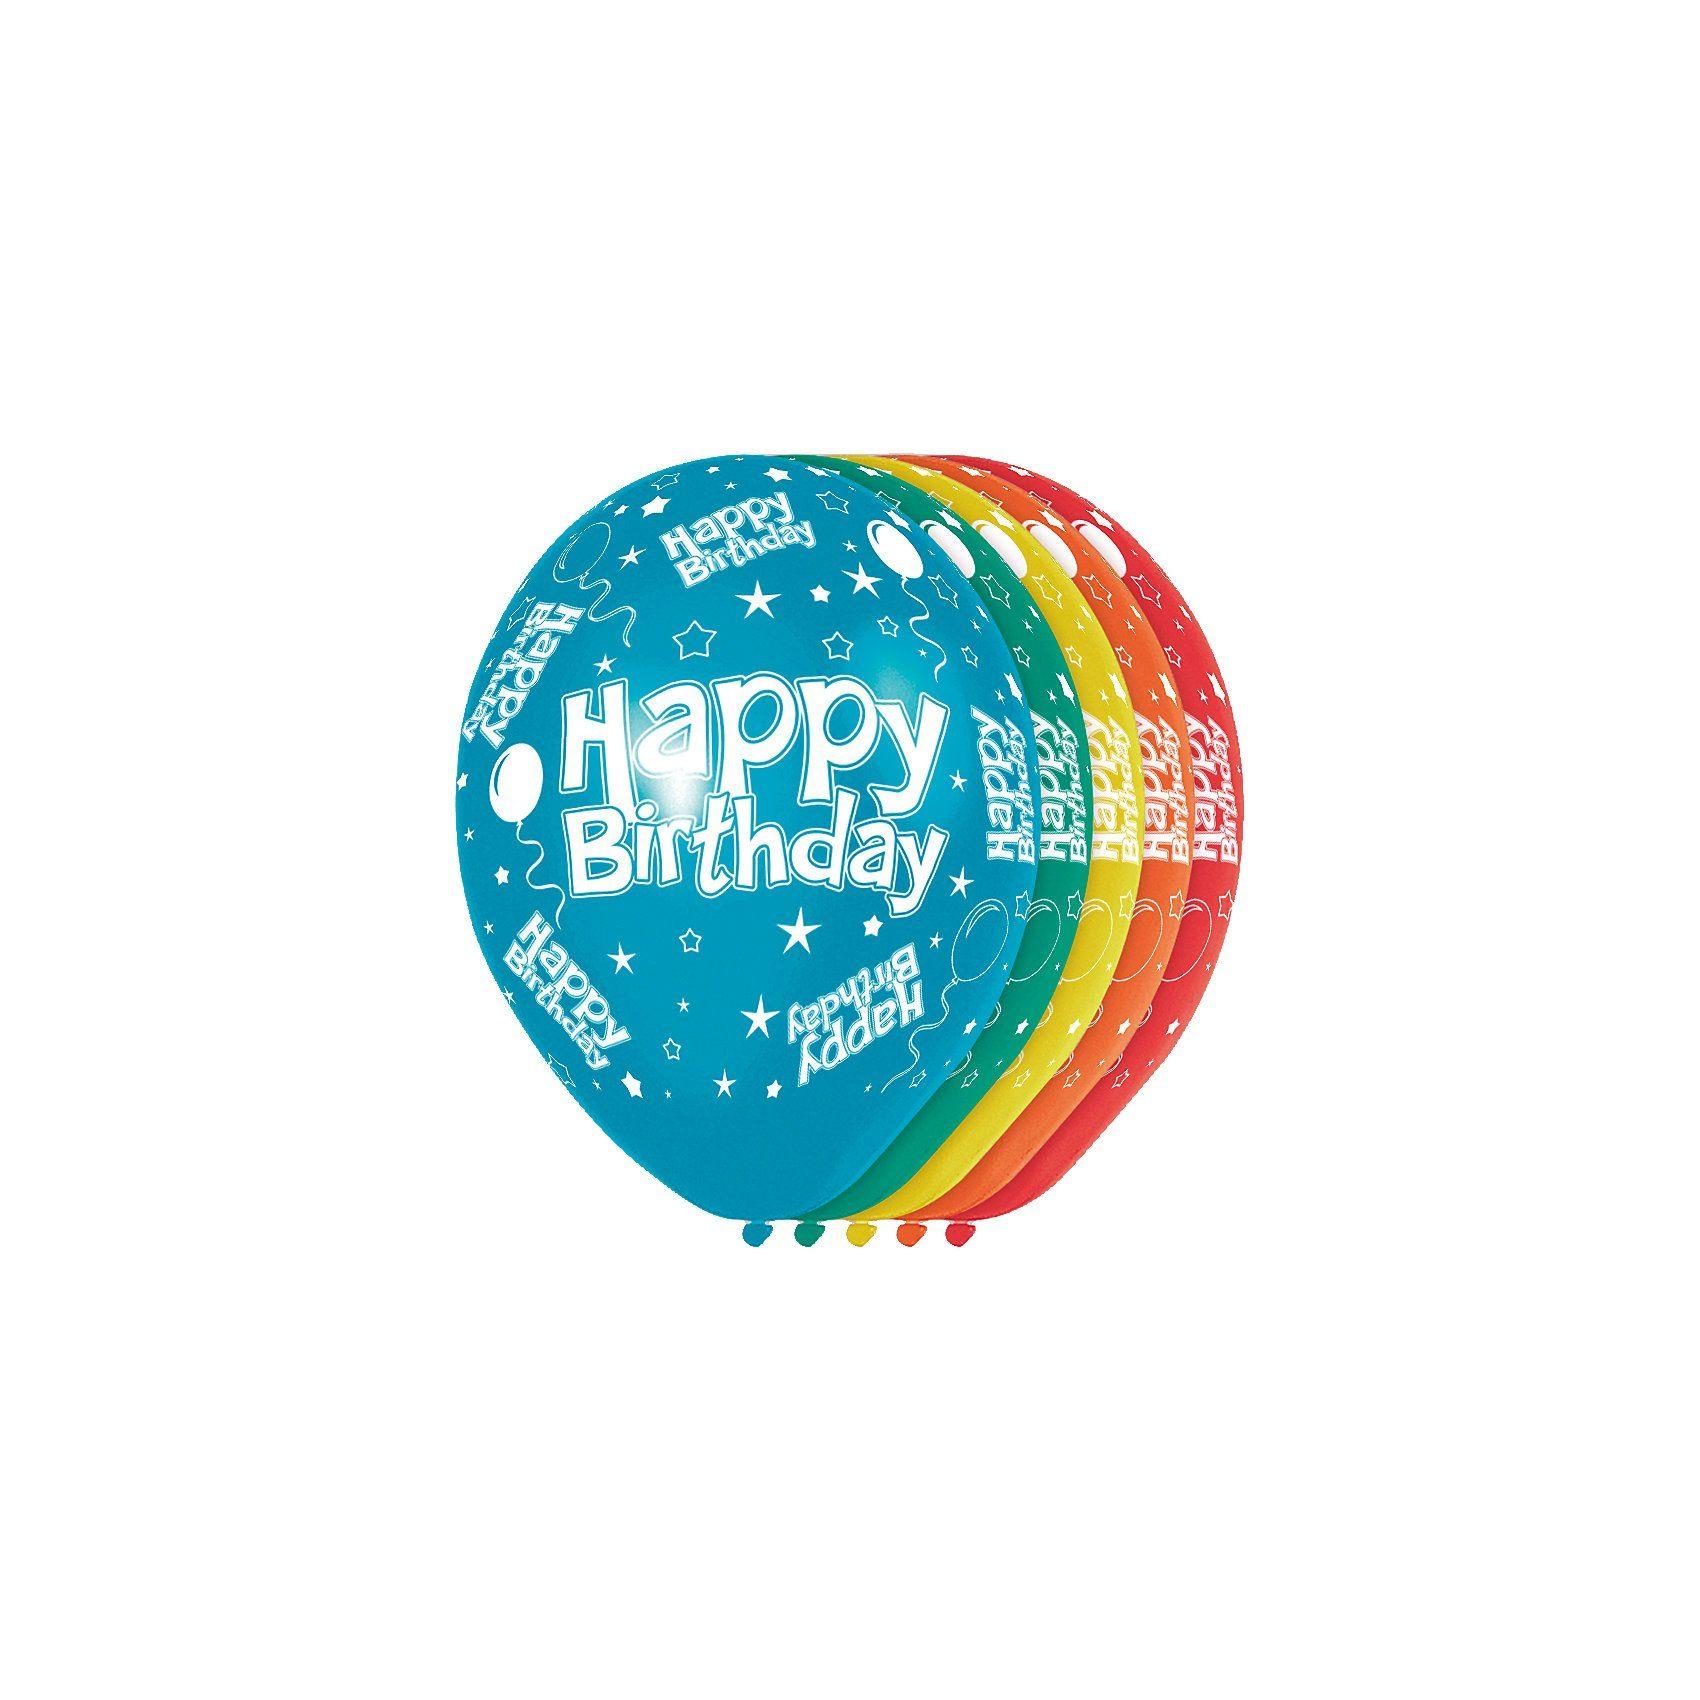 Luftbballon Happy Birthday, 5 Stück